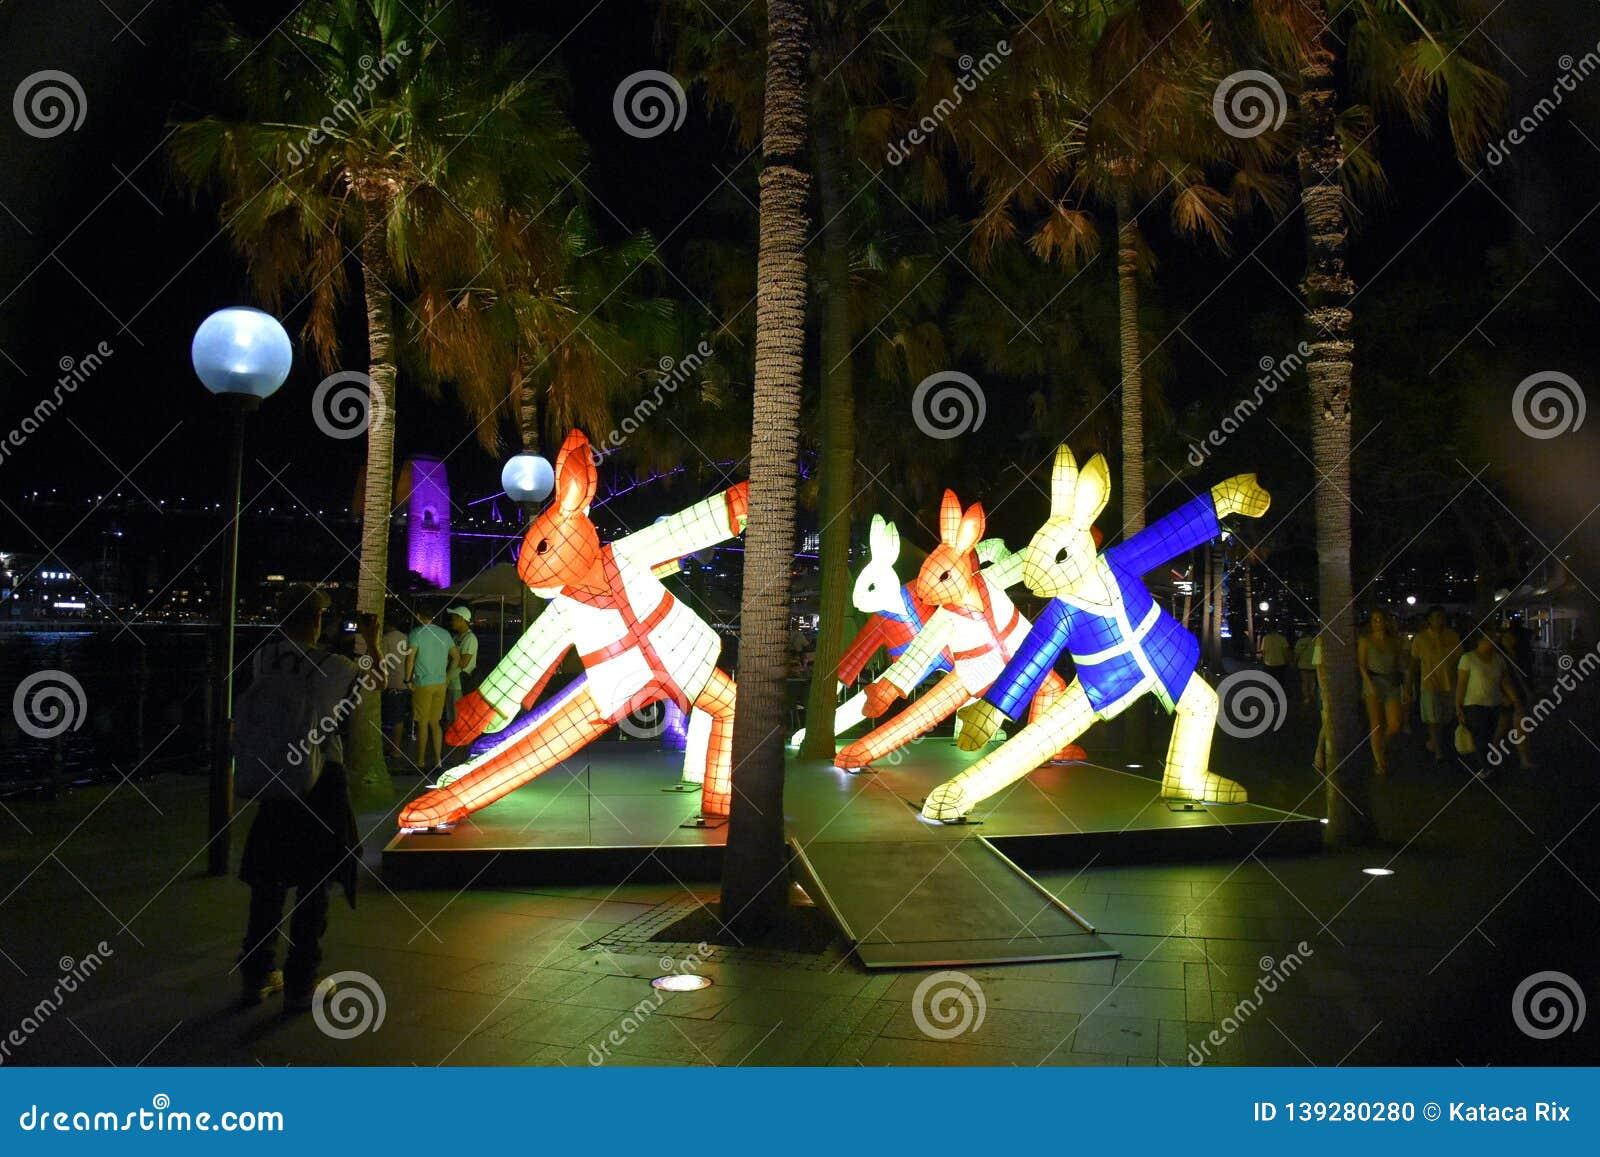 Larger than life lanterns in the shape of Rabbit. Chinese zodiac animals at Circular Quay